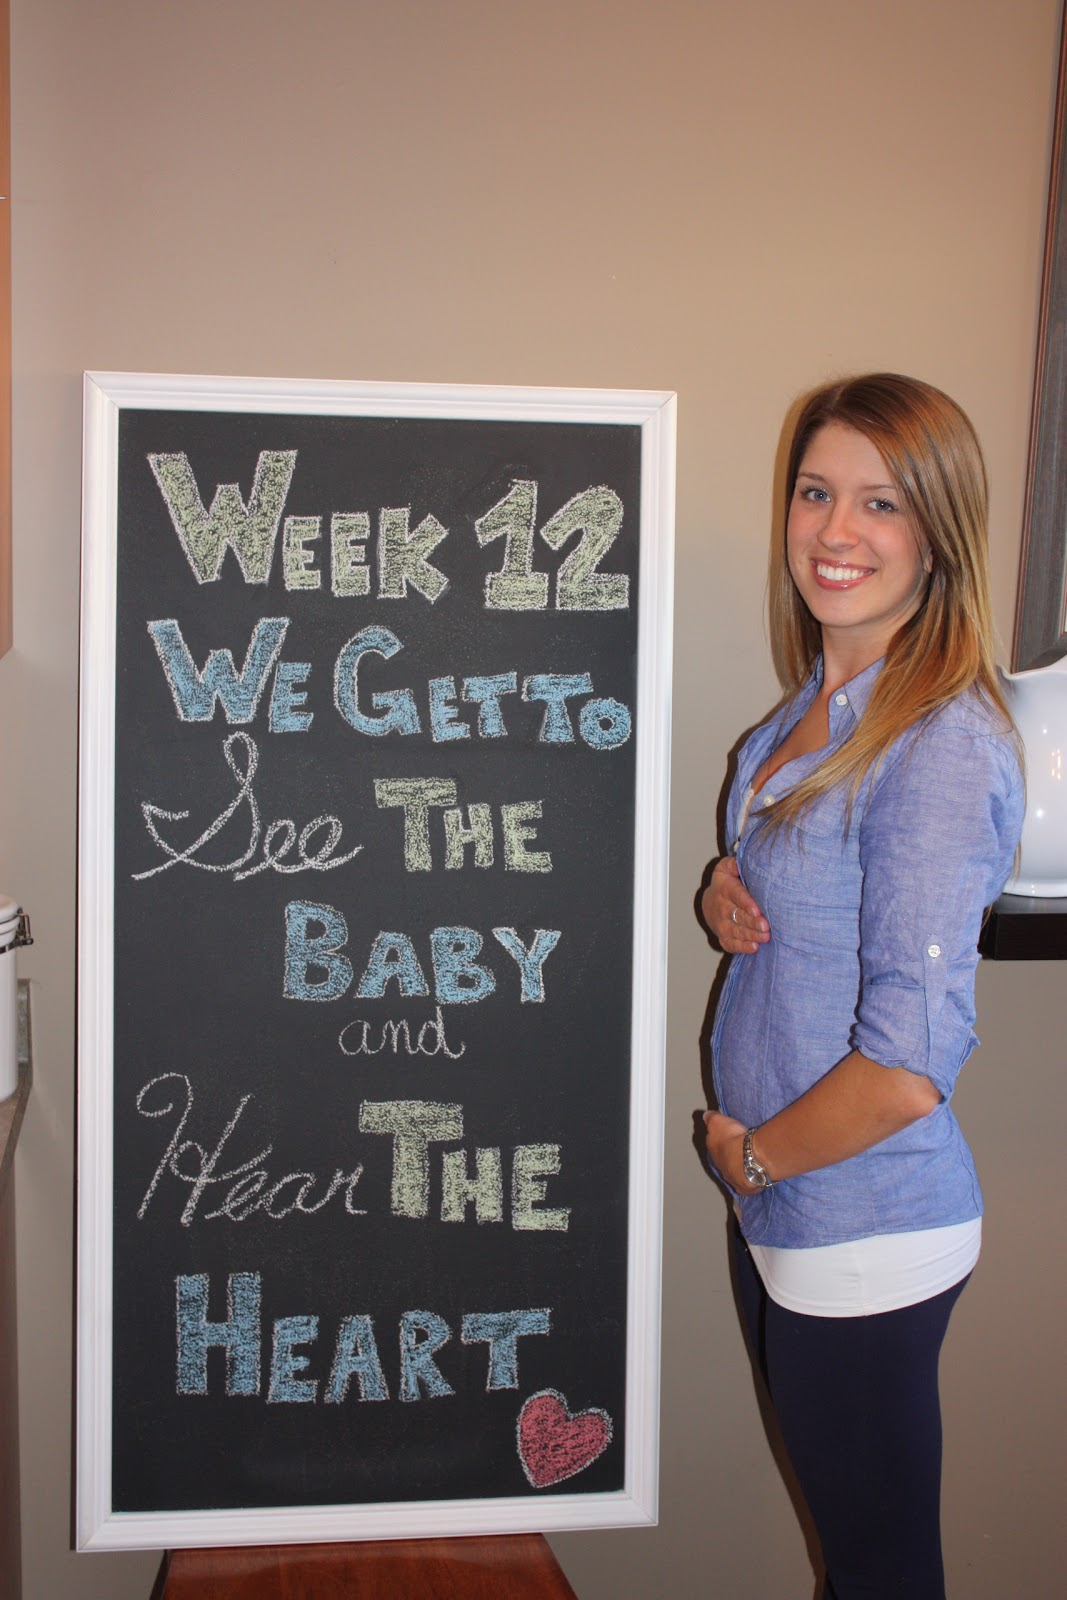 The Wonderful Wife: 12 Weeks Pregnant